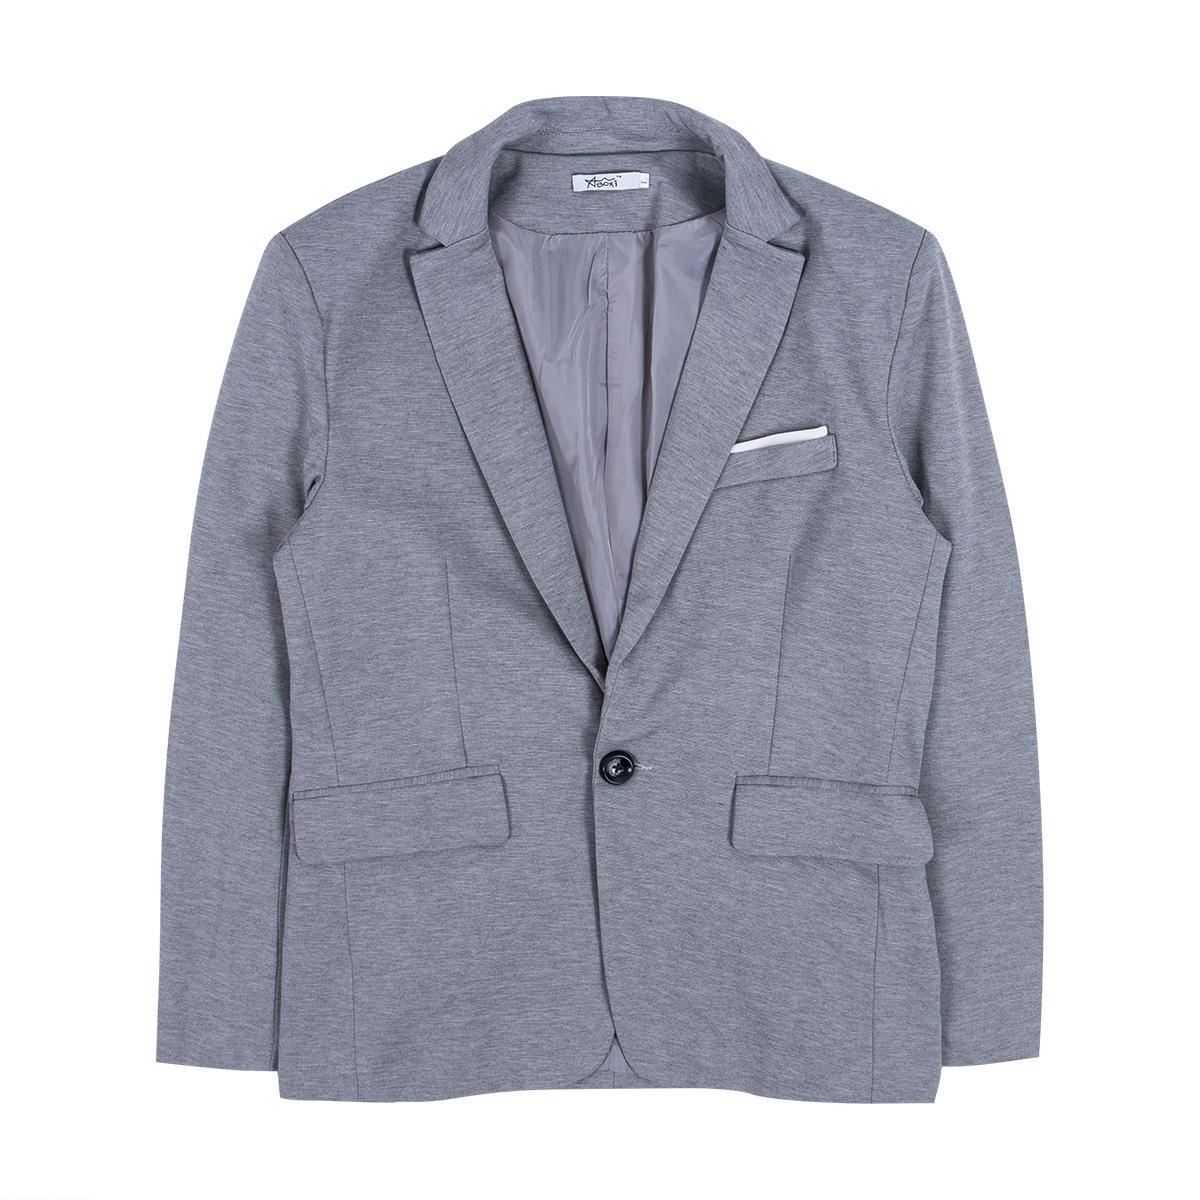 NOVO Plus Size Terno Blazers Femininos Formal Slim Fit One Button Suit Blazer Negócios Blazers homens homens